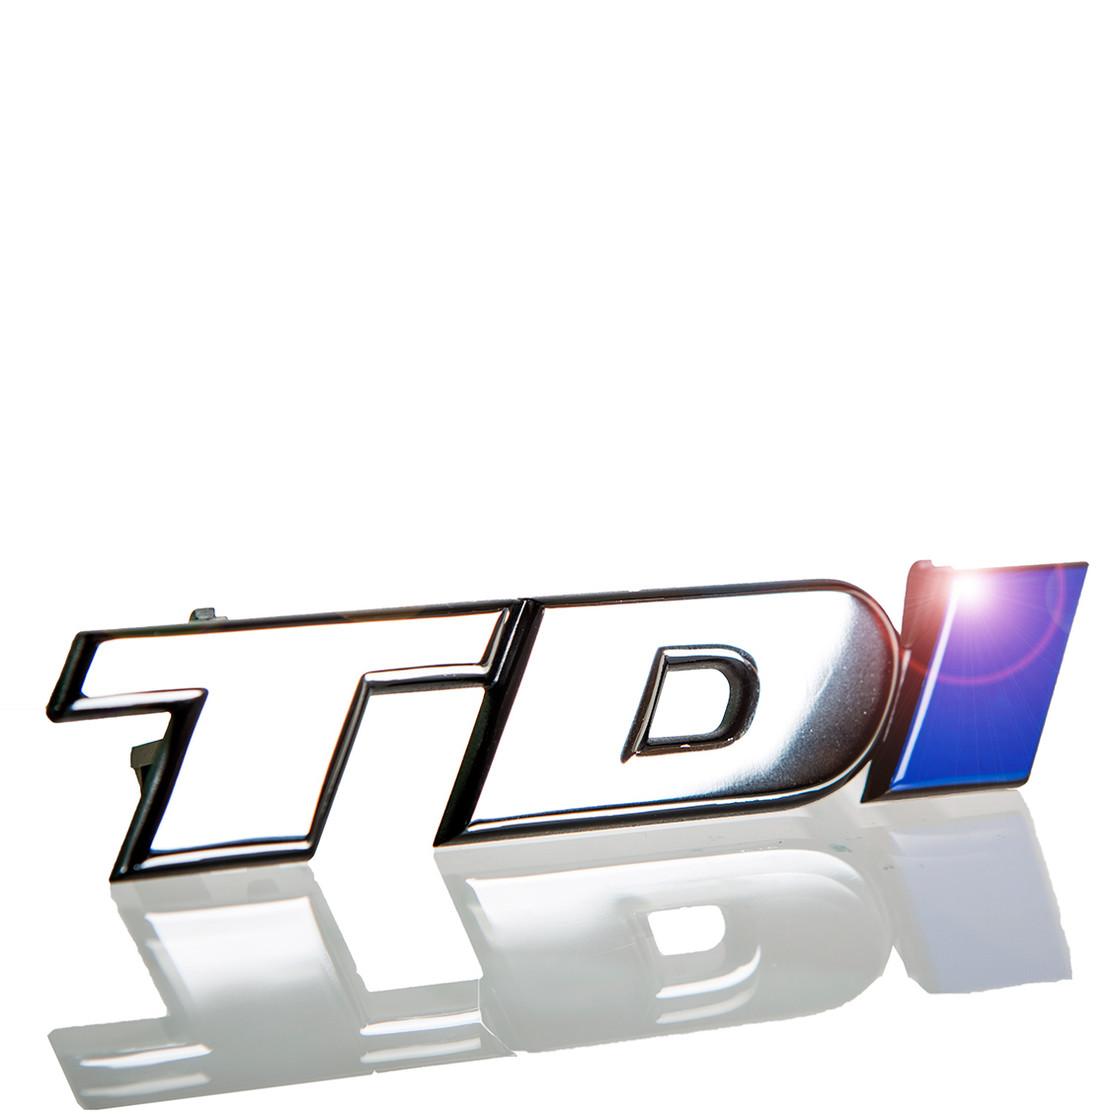 Original VW Eurovan Transporter Schriftzug TDI für T4 701853679AHCE